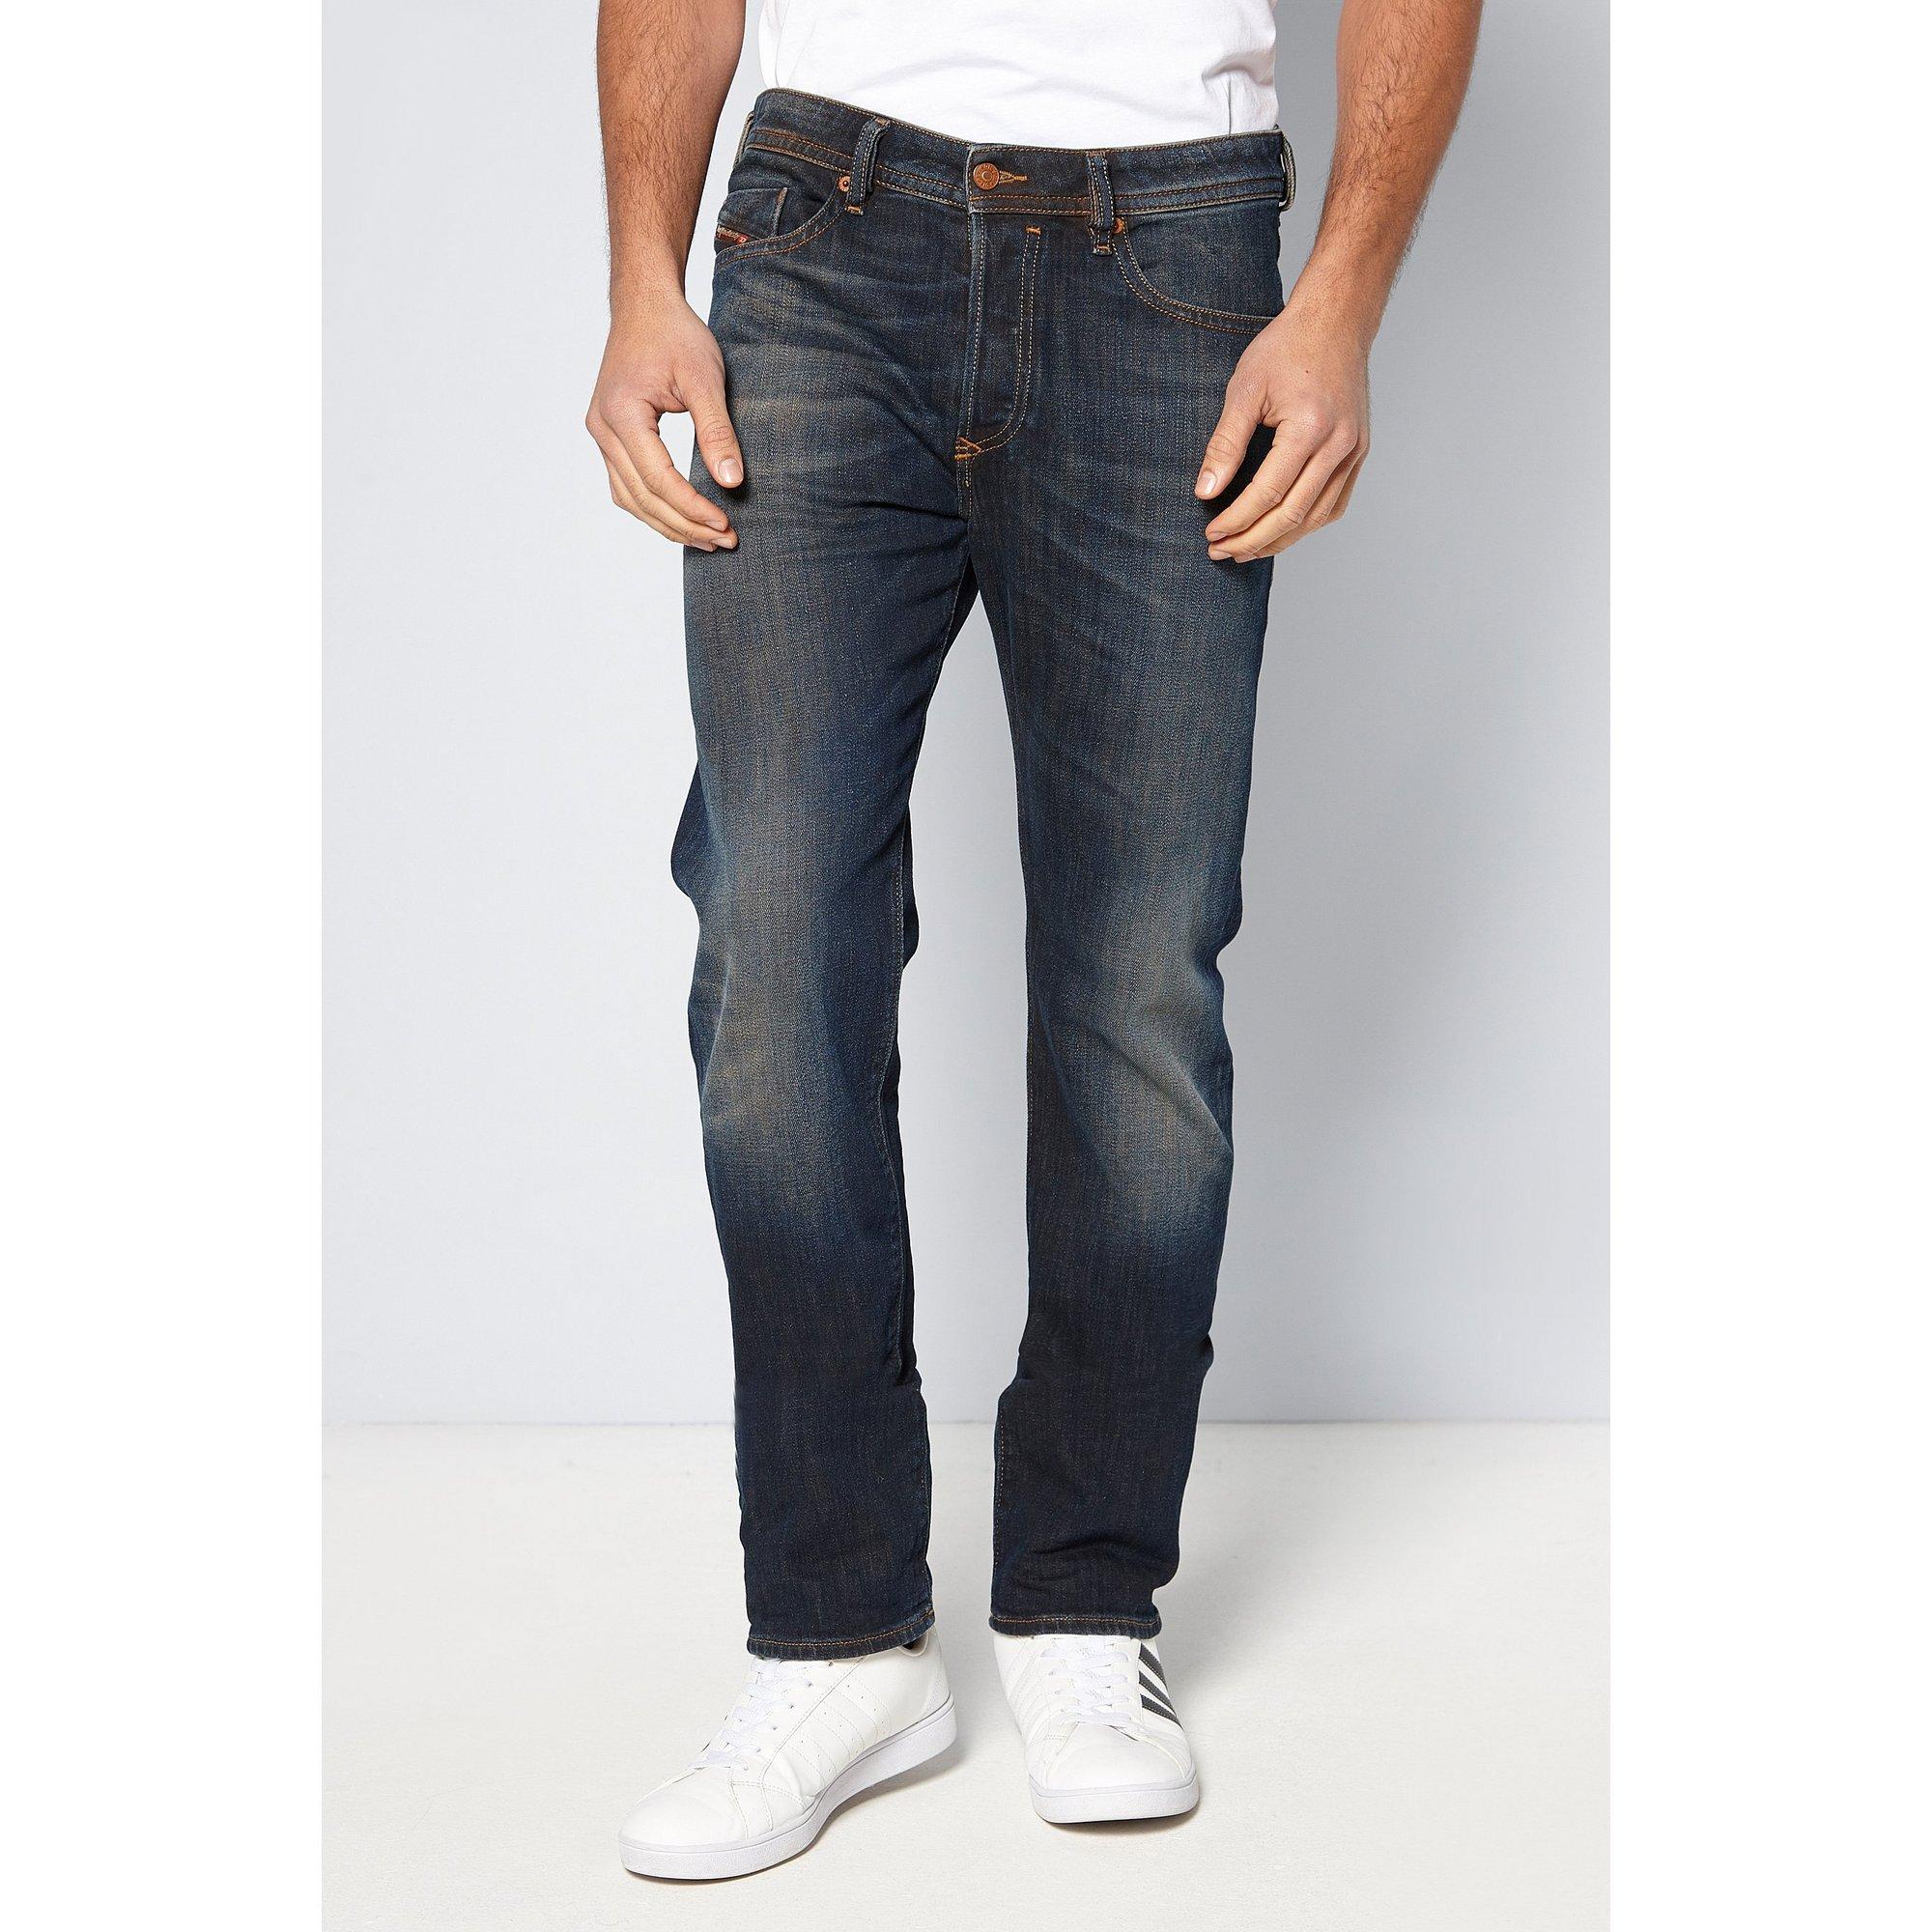 Image of Diesel Buster Stretch Denim Jeans